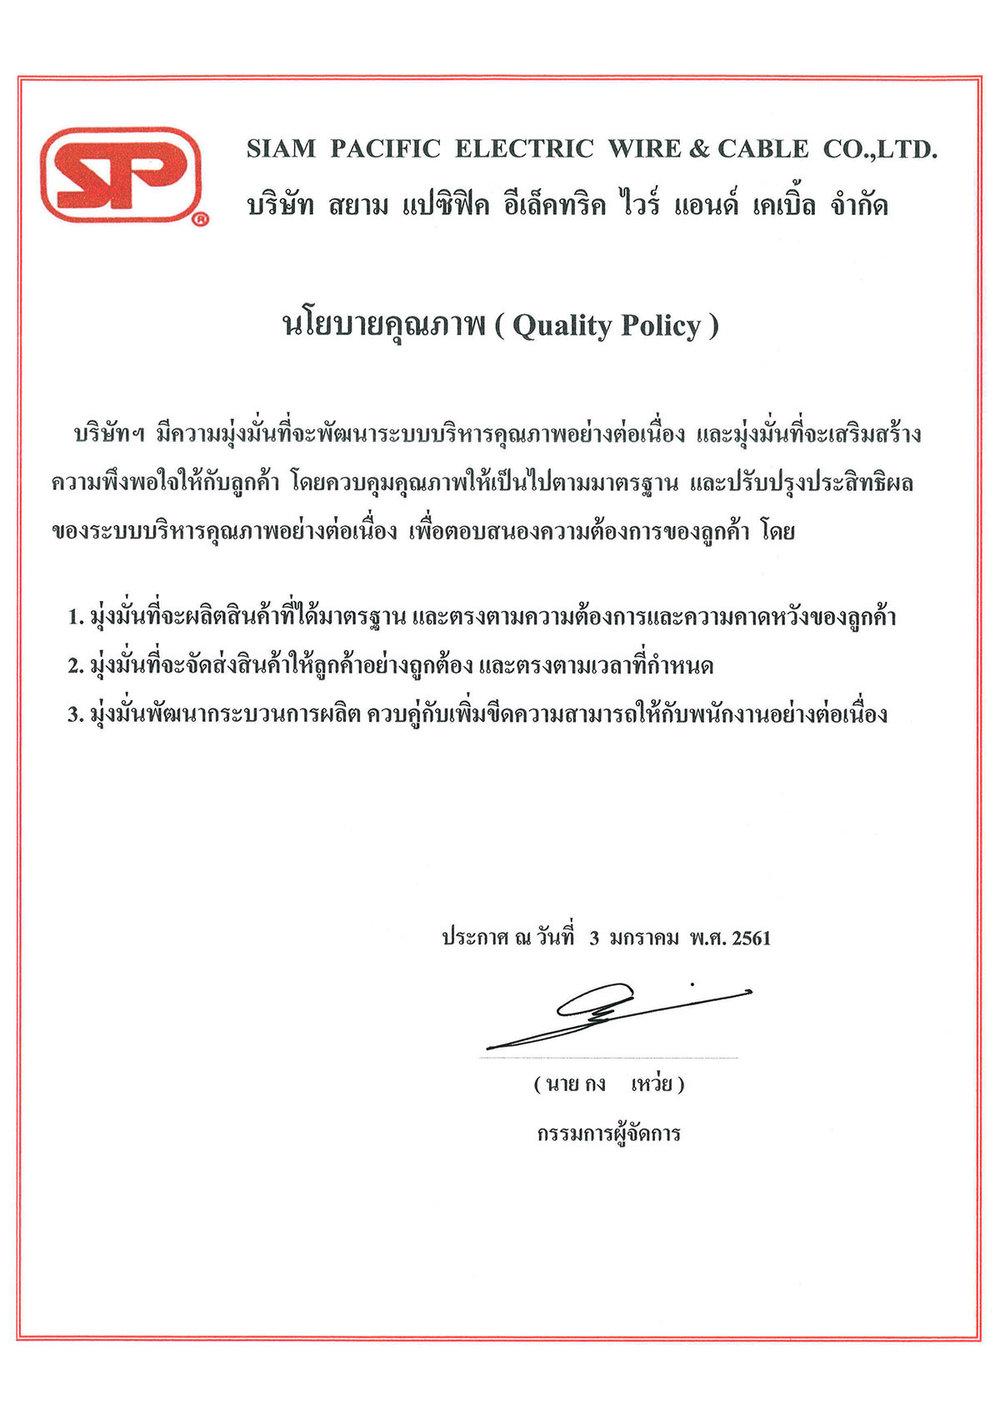 9001 policy.jpg